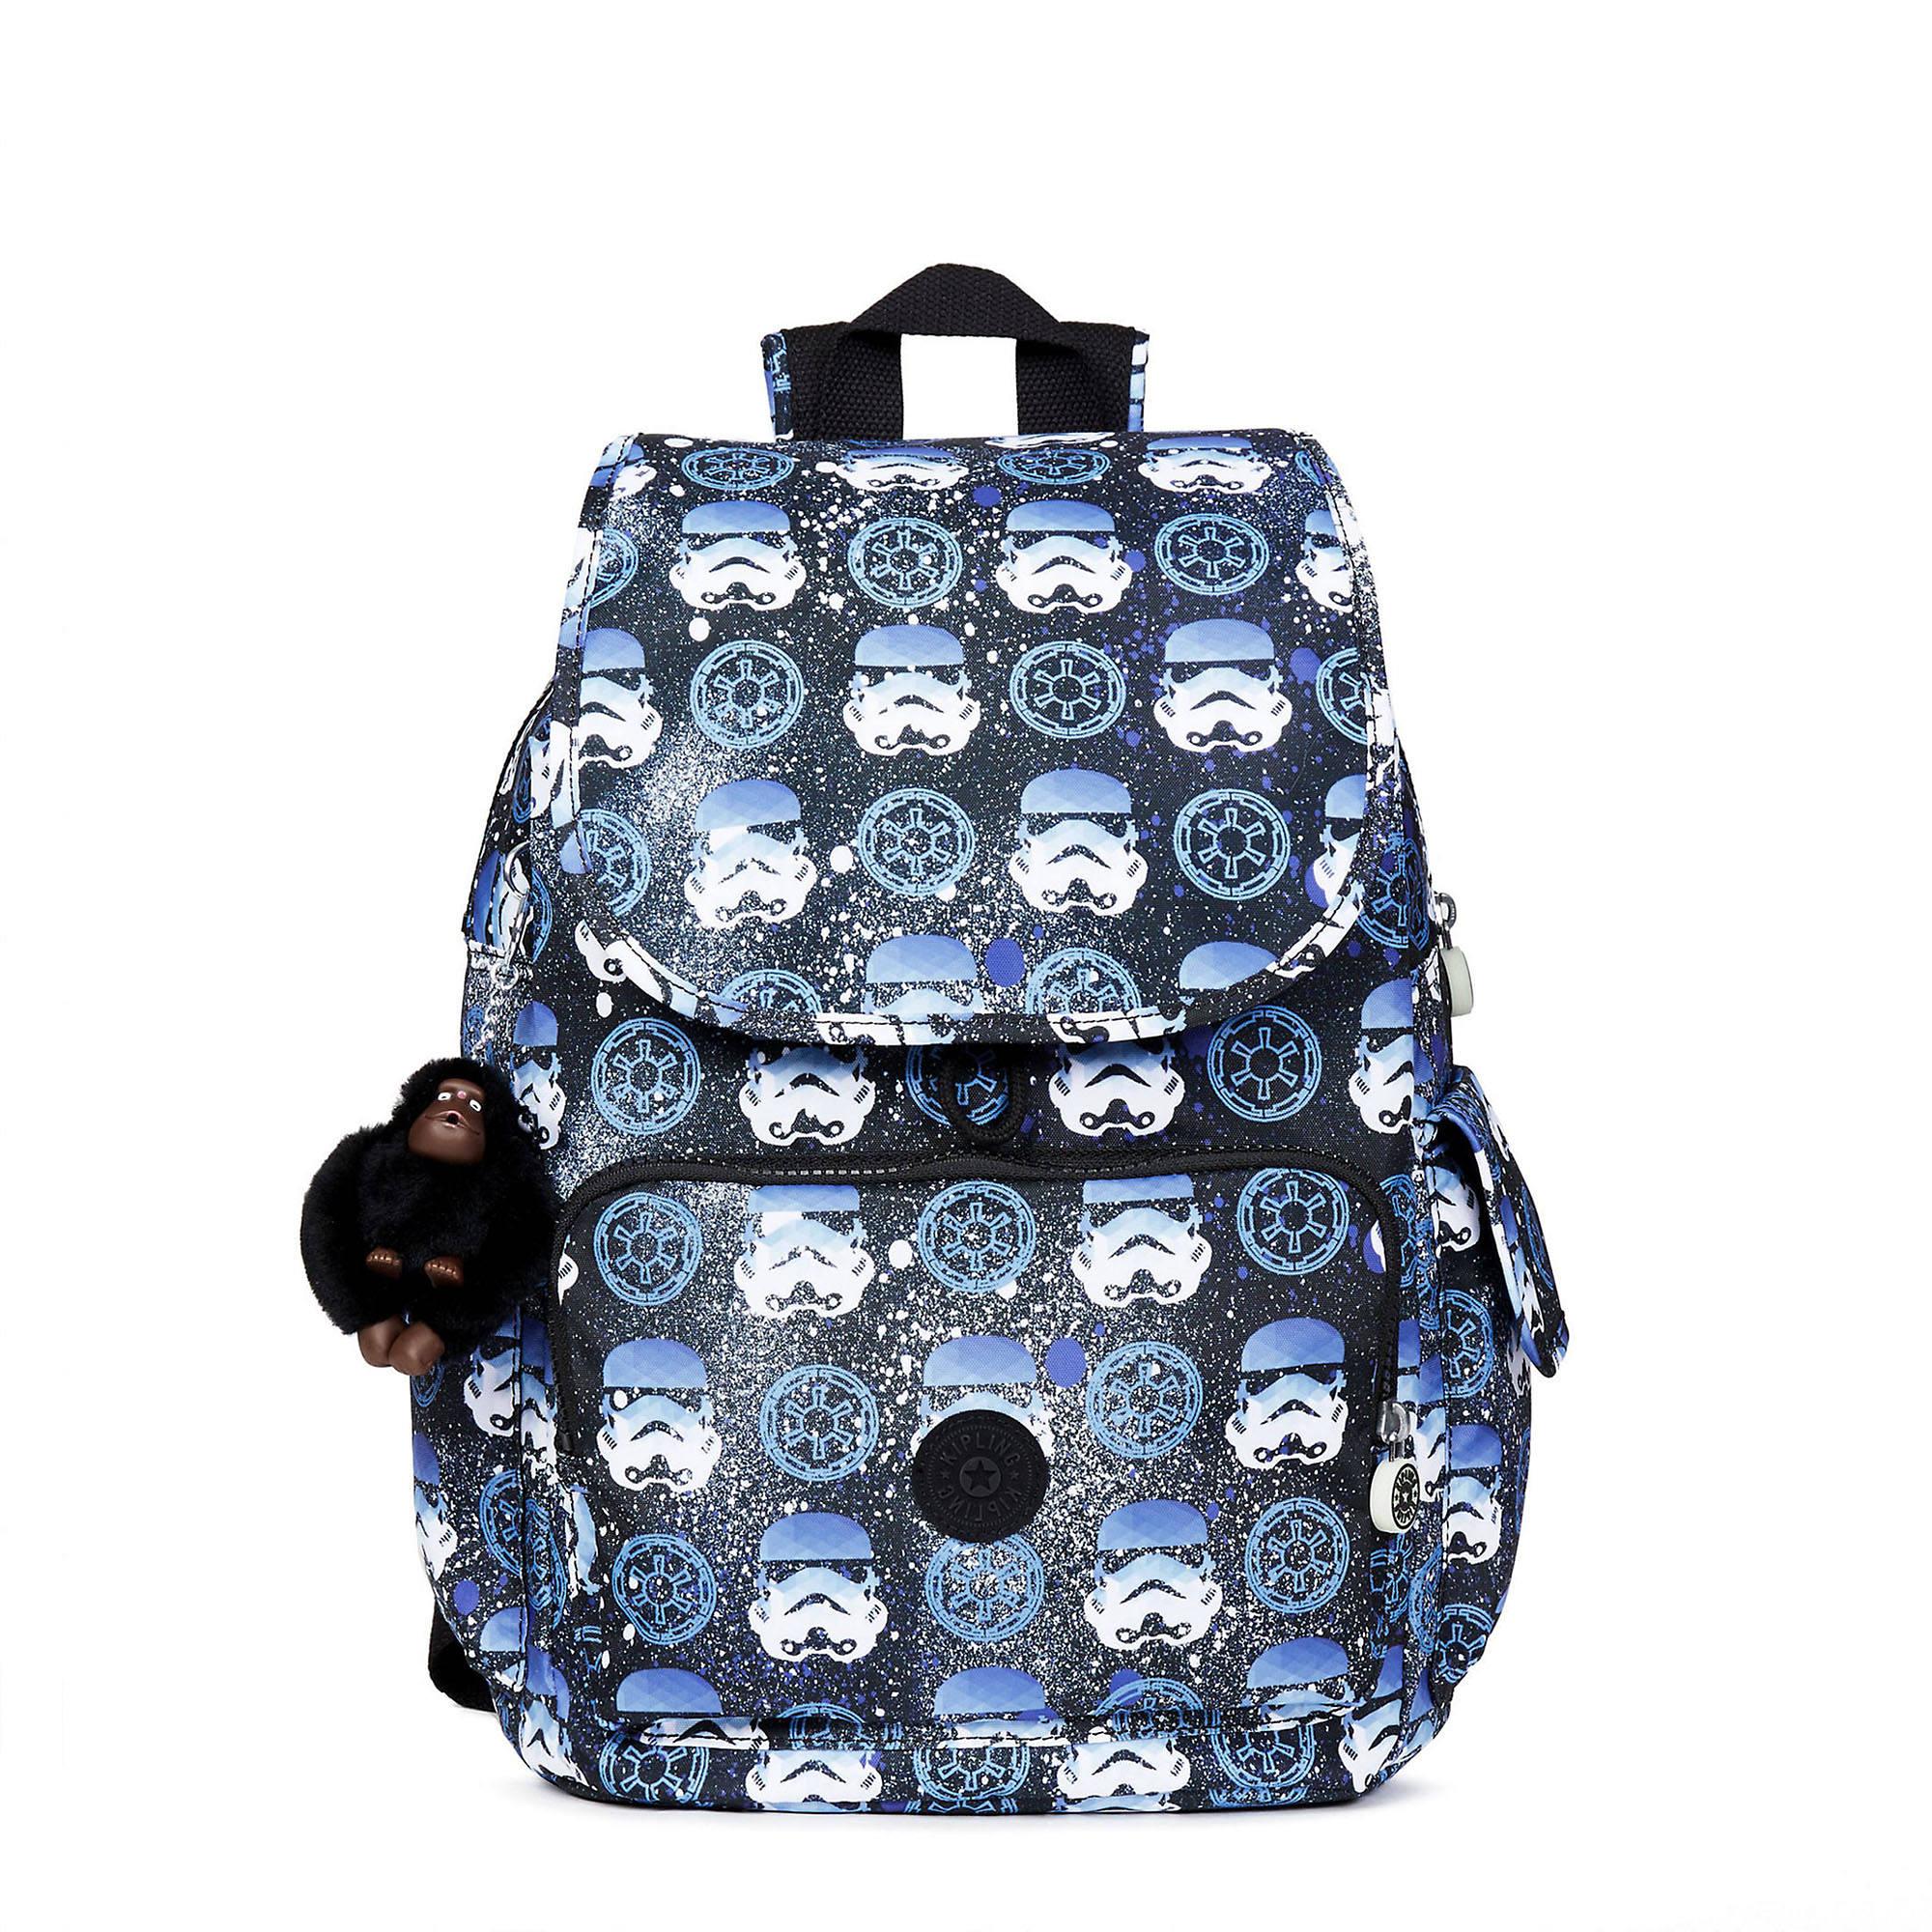 15f8d4361 Star Wars City Pack Printed Medium Backpack,Surreal Dot,large